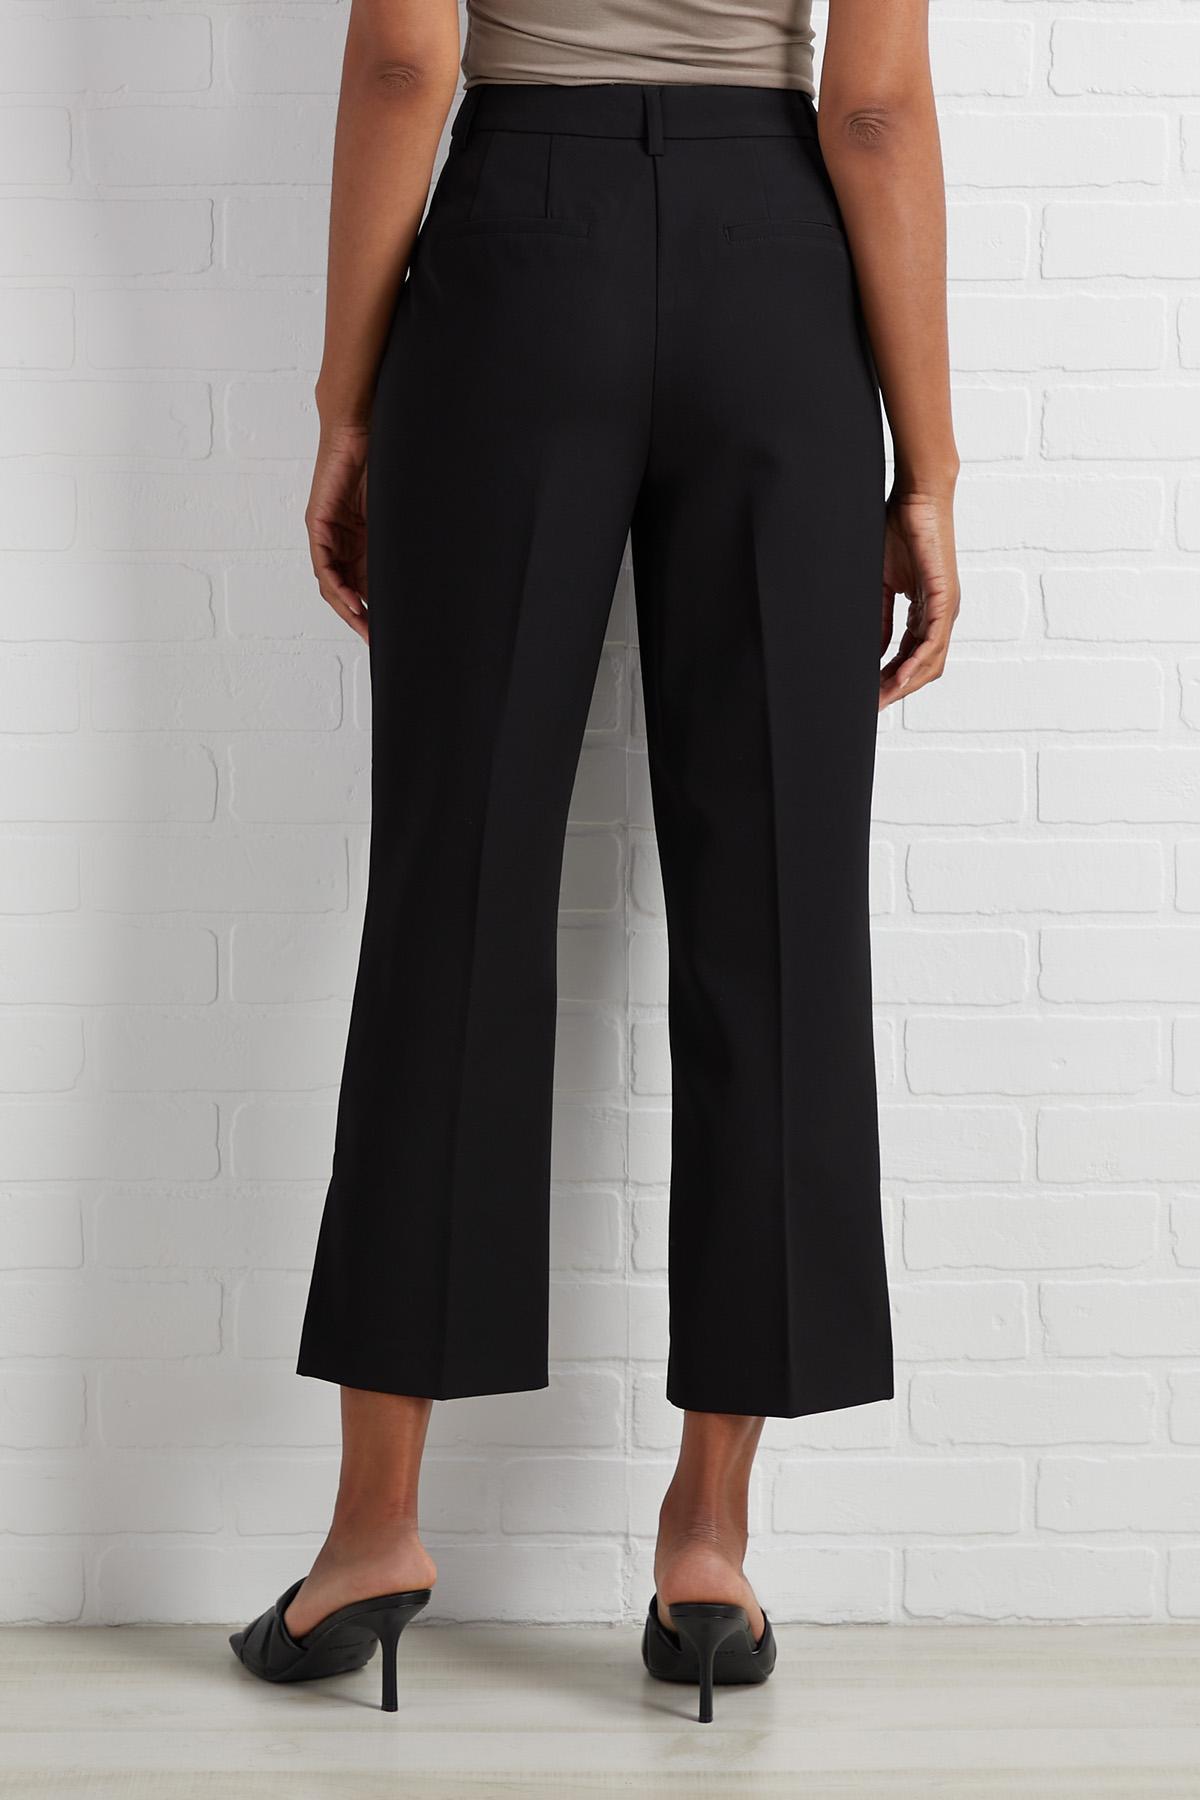 Just Essential Pants